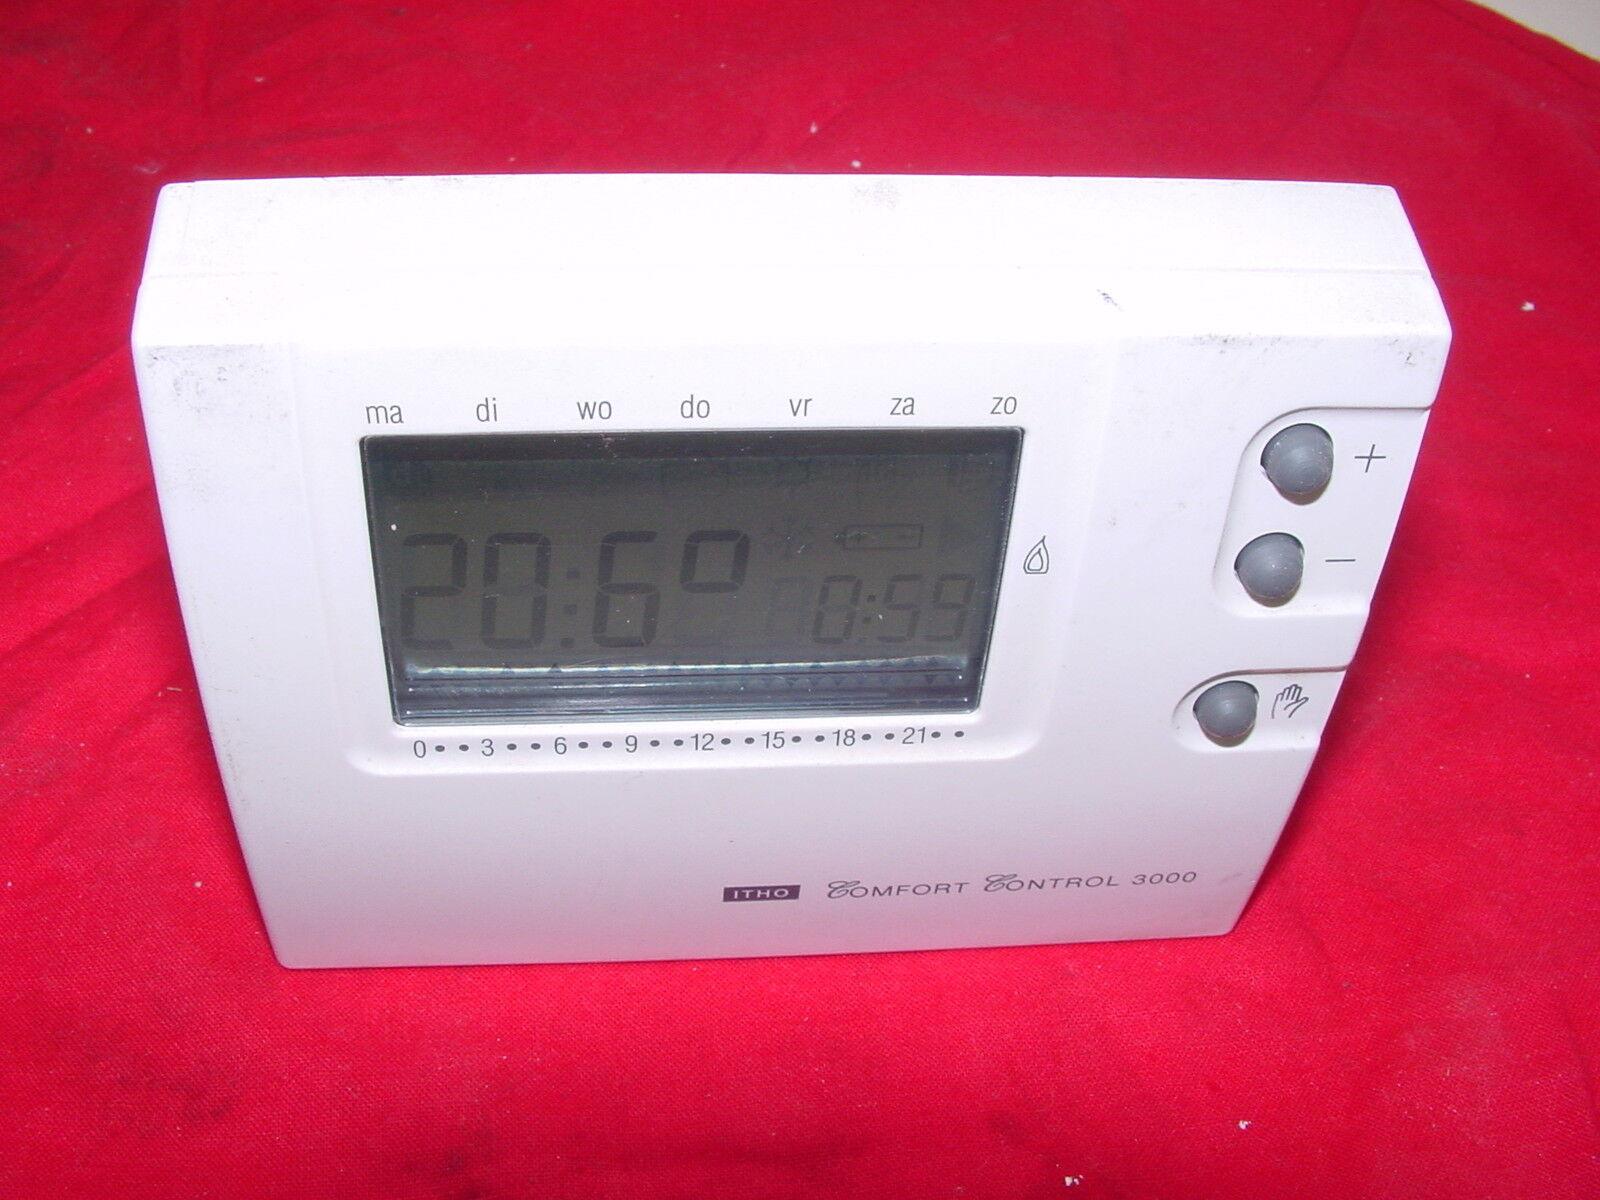 Cenvax Energycontrol Theben RAM 797 Comfort Control 3000 > Steuerung/Heizung